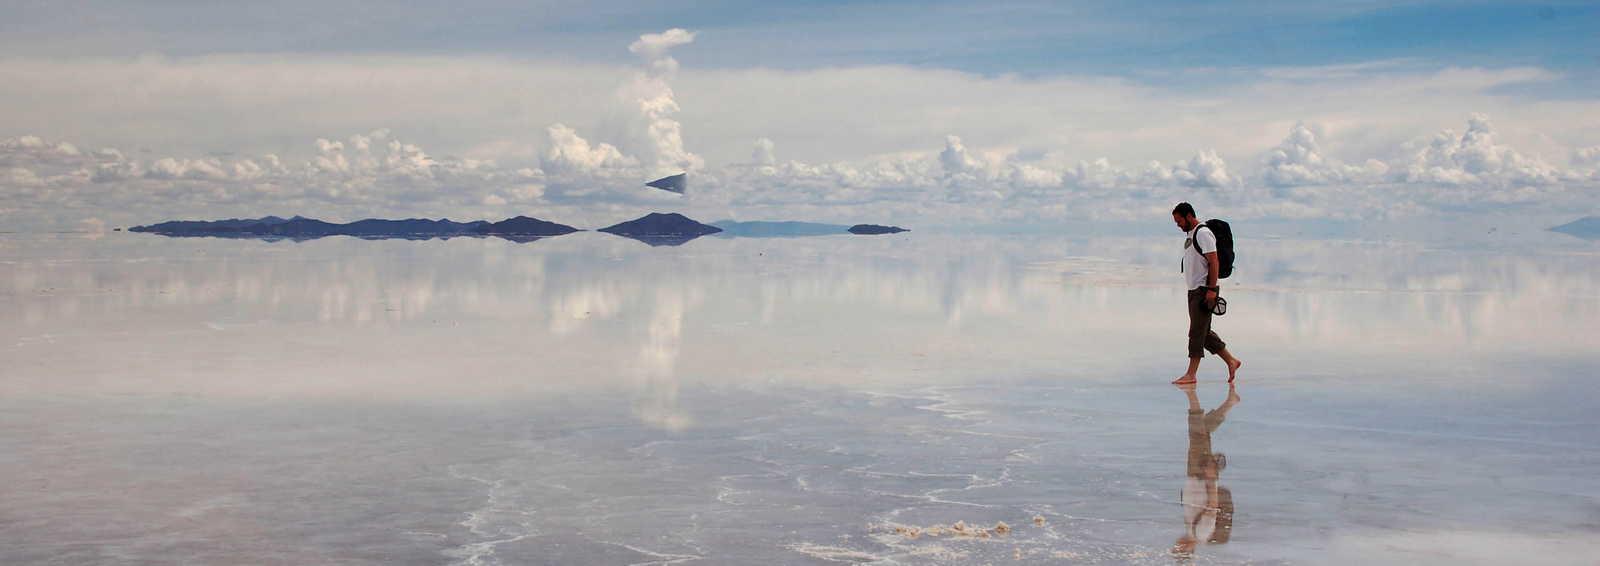 Salt flats Puna Altiplano